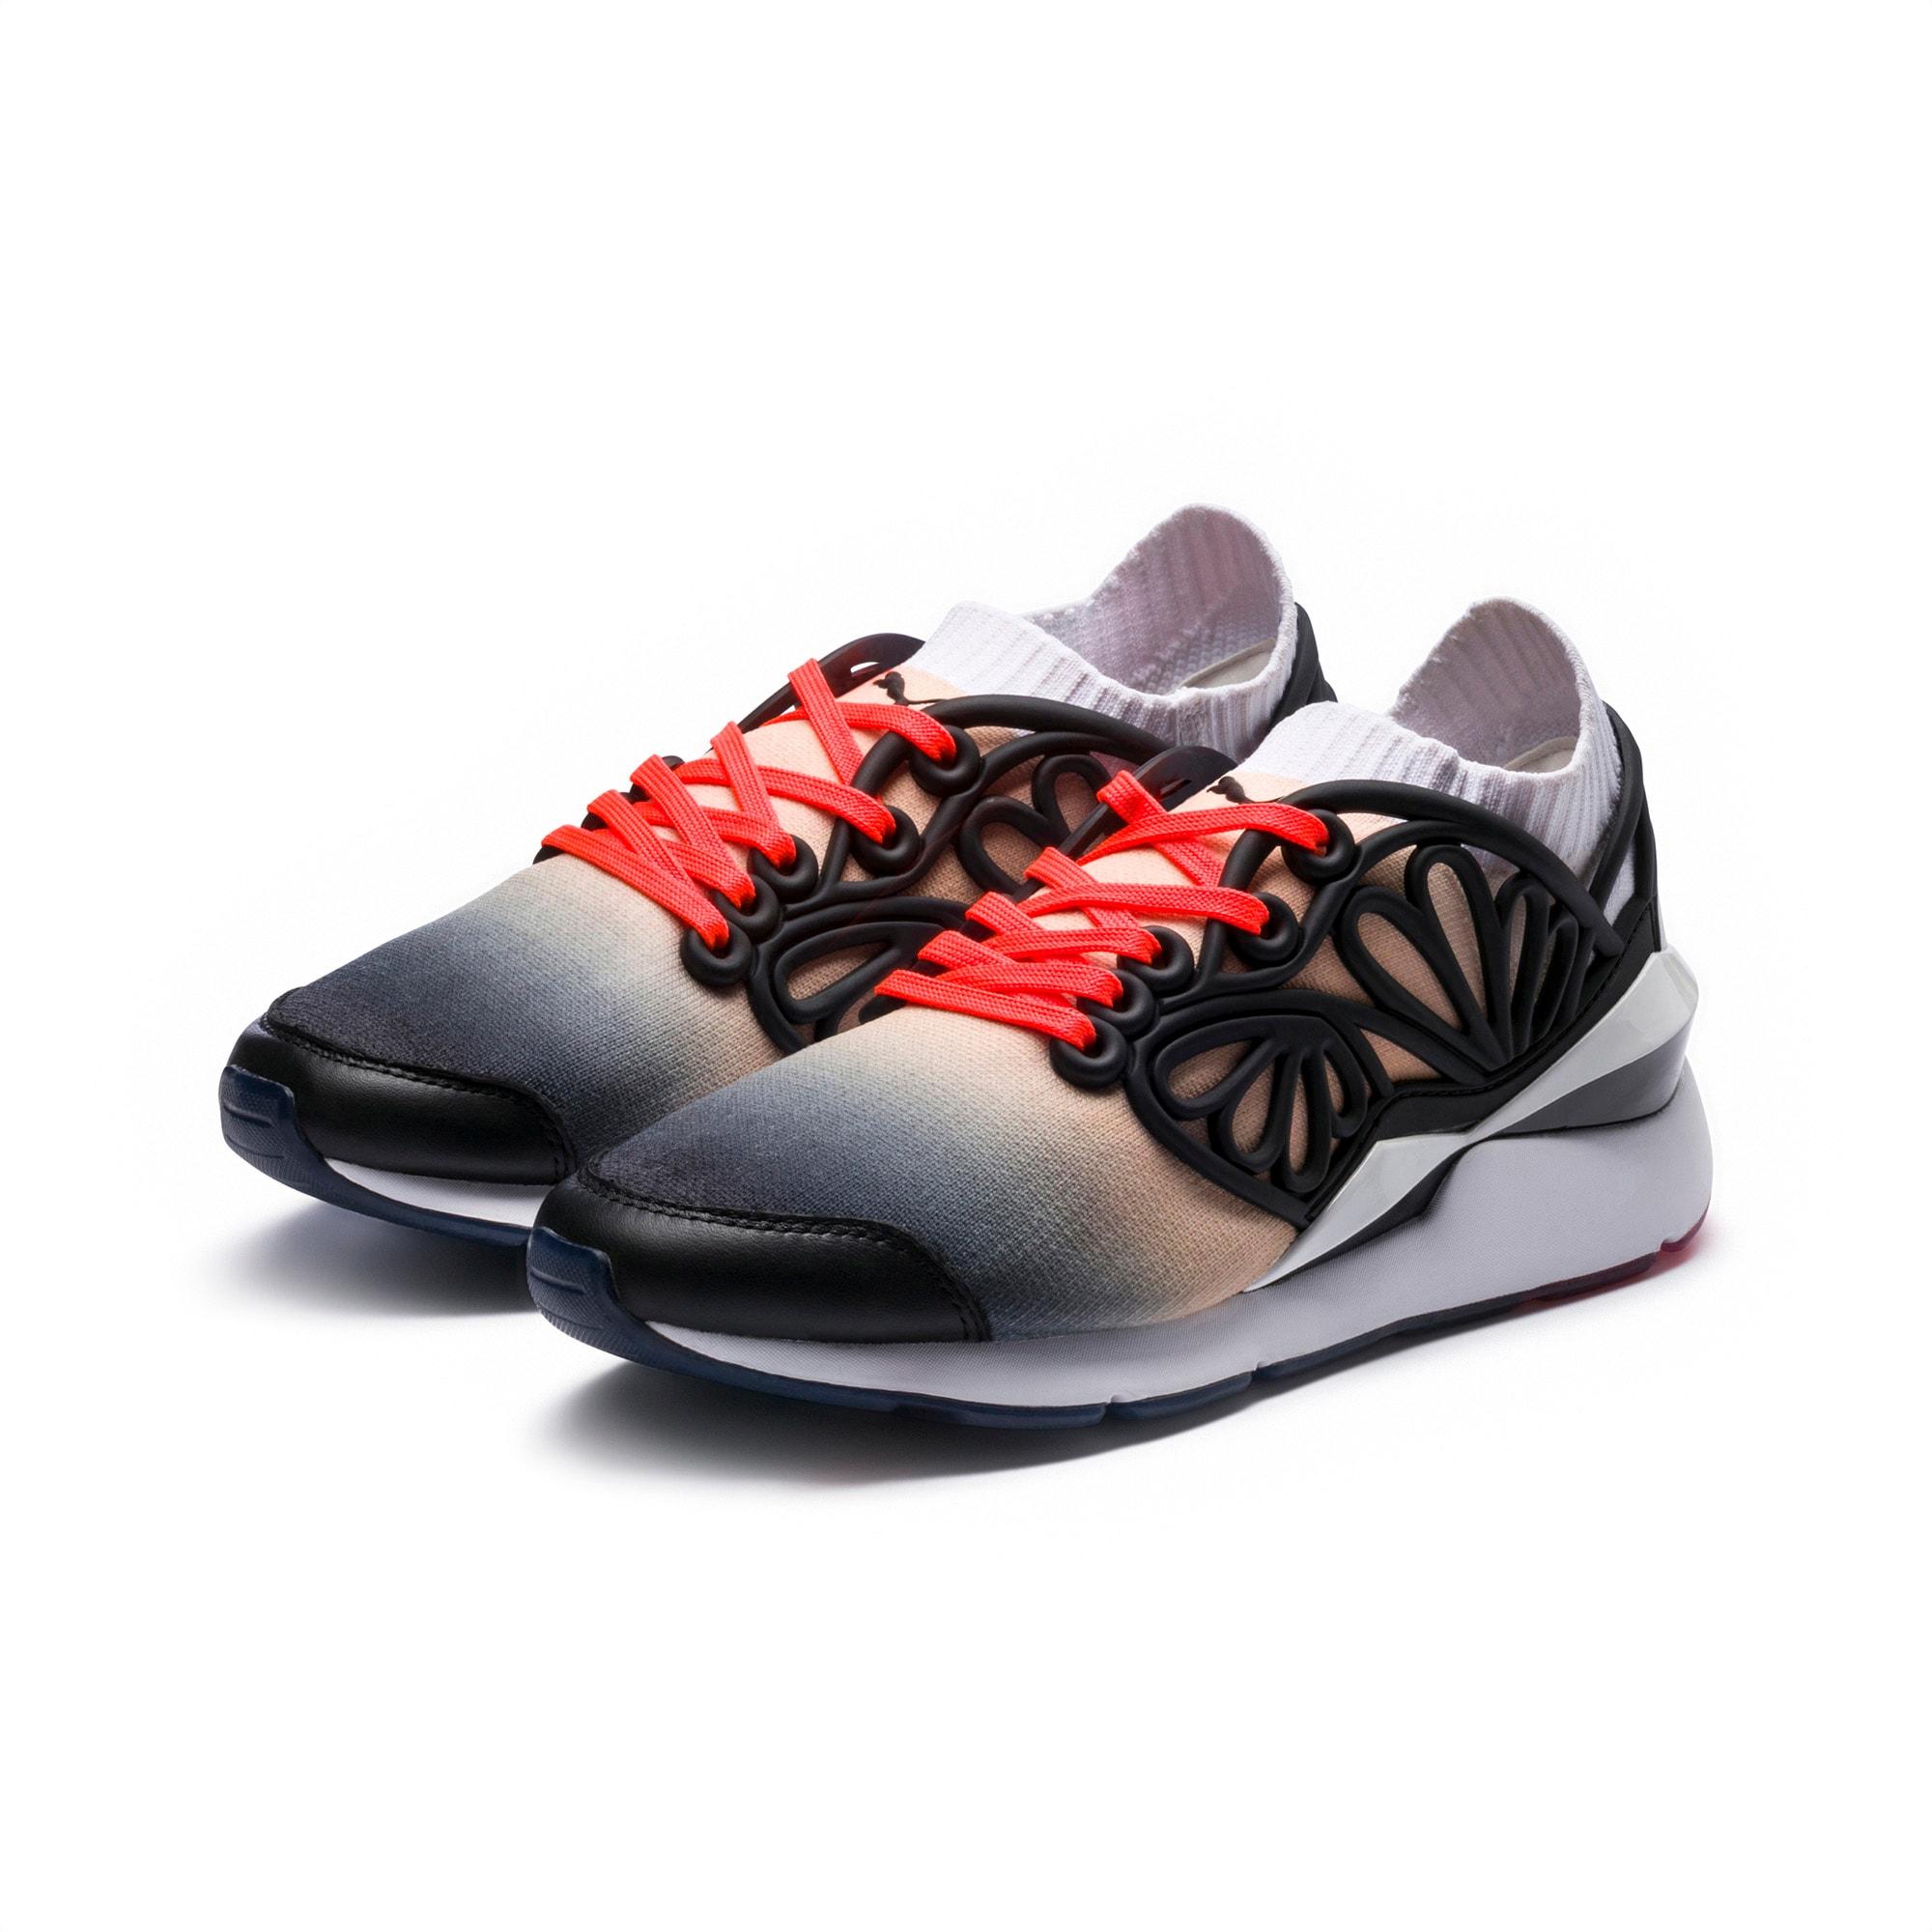 PUMA x SOPHIA WEBSTER Damen Pearl Cage Sneaker mit Farbverlauf